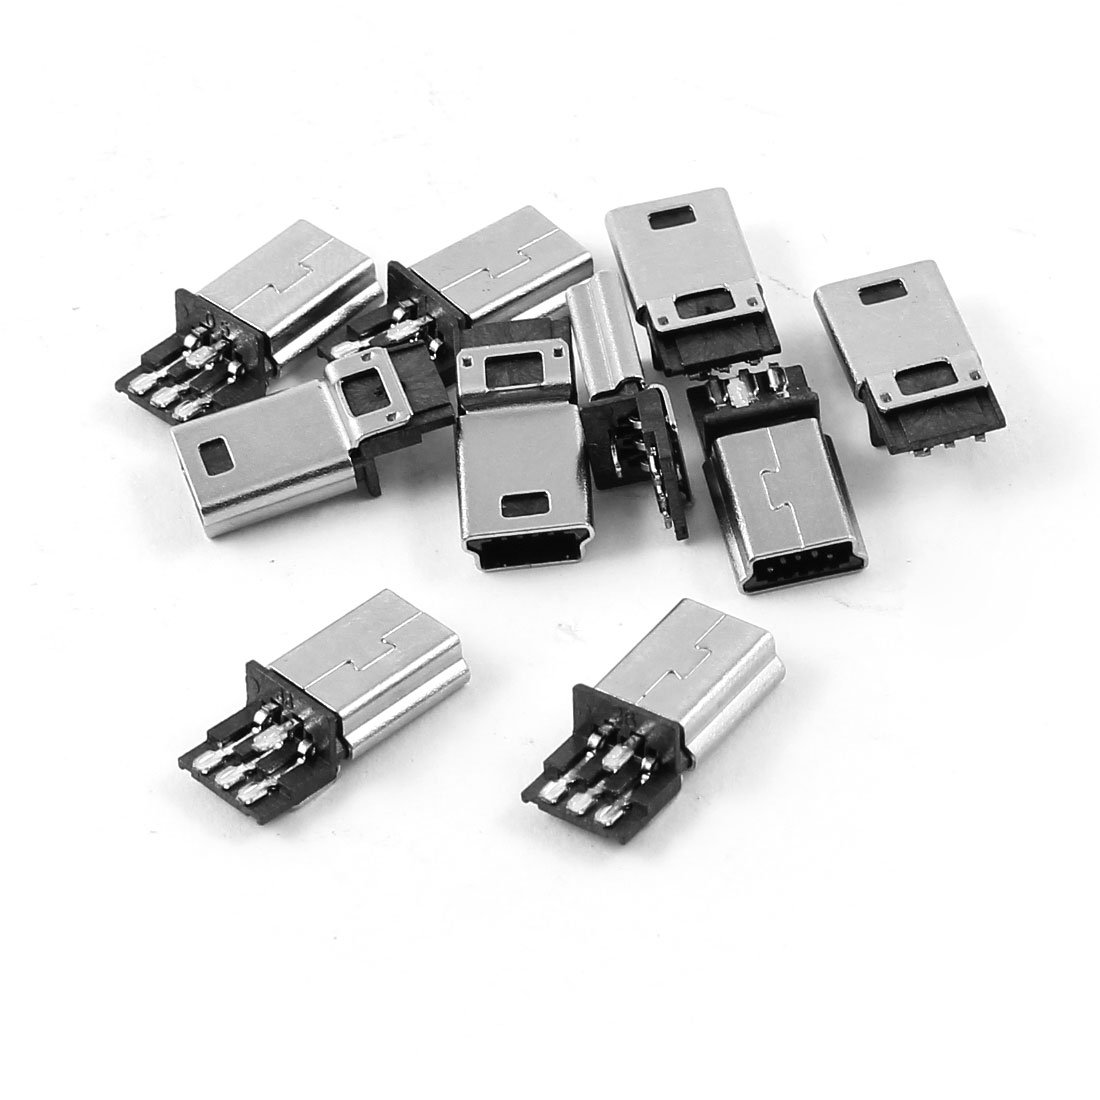 USB Buchse Typ Mini 5-polig 90° abgewinkelt USB 2.0 Einbaubuchse SMD SMT